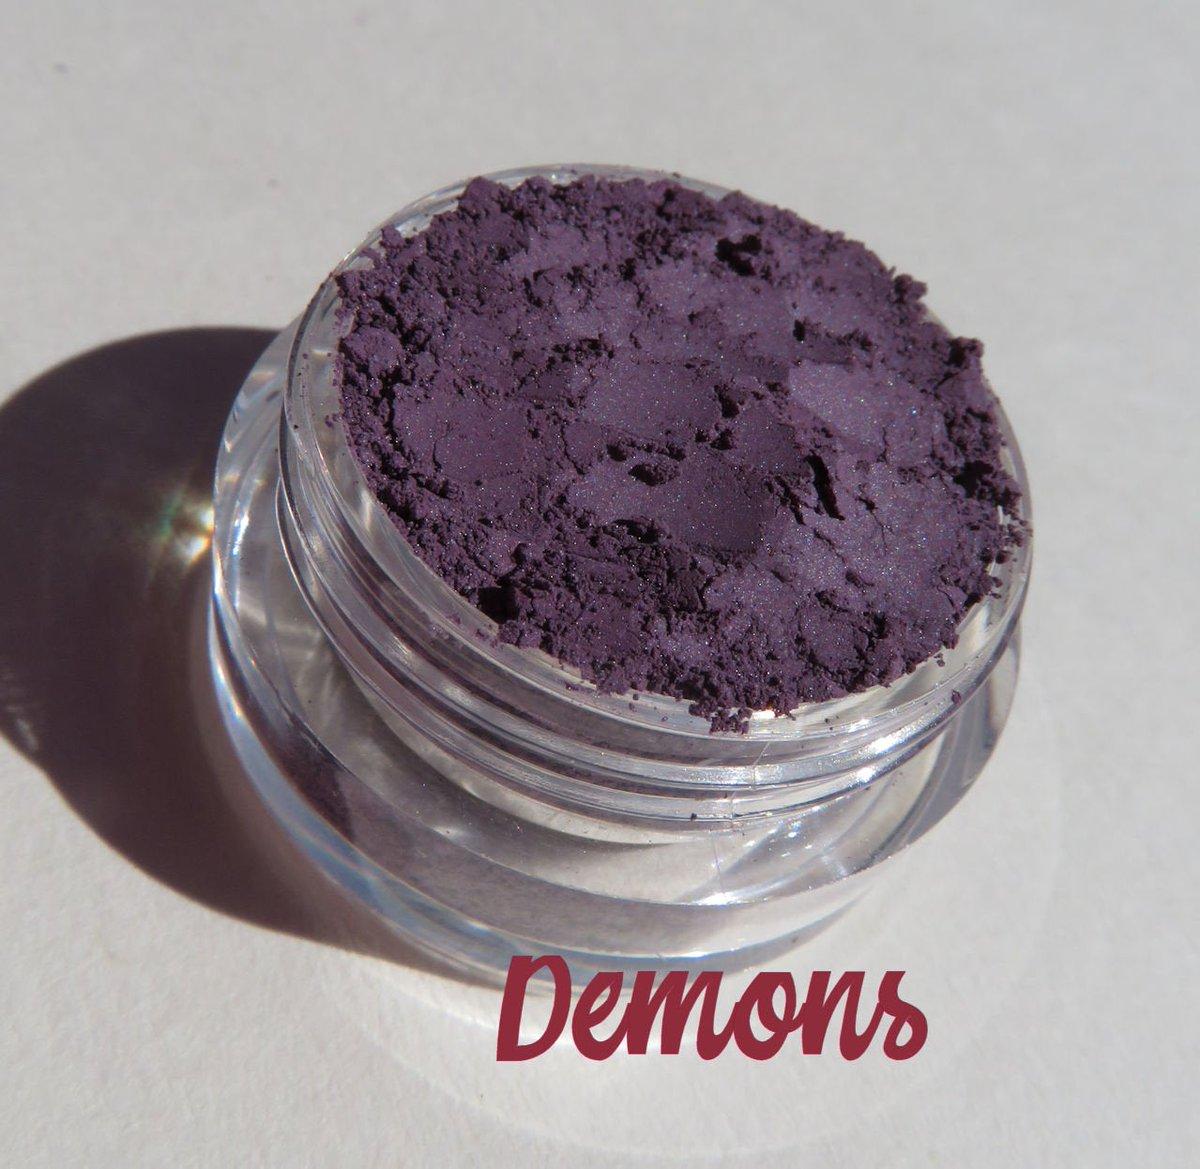 DEMONS -Matte Dark Plum Blue Purple Mineral Eyeshadow | Loose Pigments | Cruelty-Free | Vegan Mineral Eye Shadow #overallbeautyminerals #veganmakeup #mineraleyeshadow #demonsmineraleyeshadow #darkplumpurpleloosepigments #crueltyfree #shopsmallbusiness  https://etsy.me/2MuFciEpic.twitter.com/vly2hqouF4